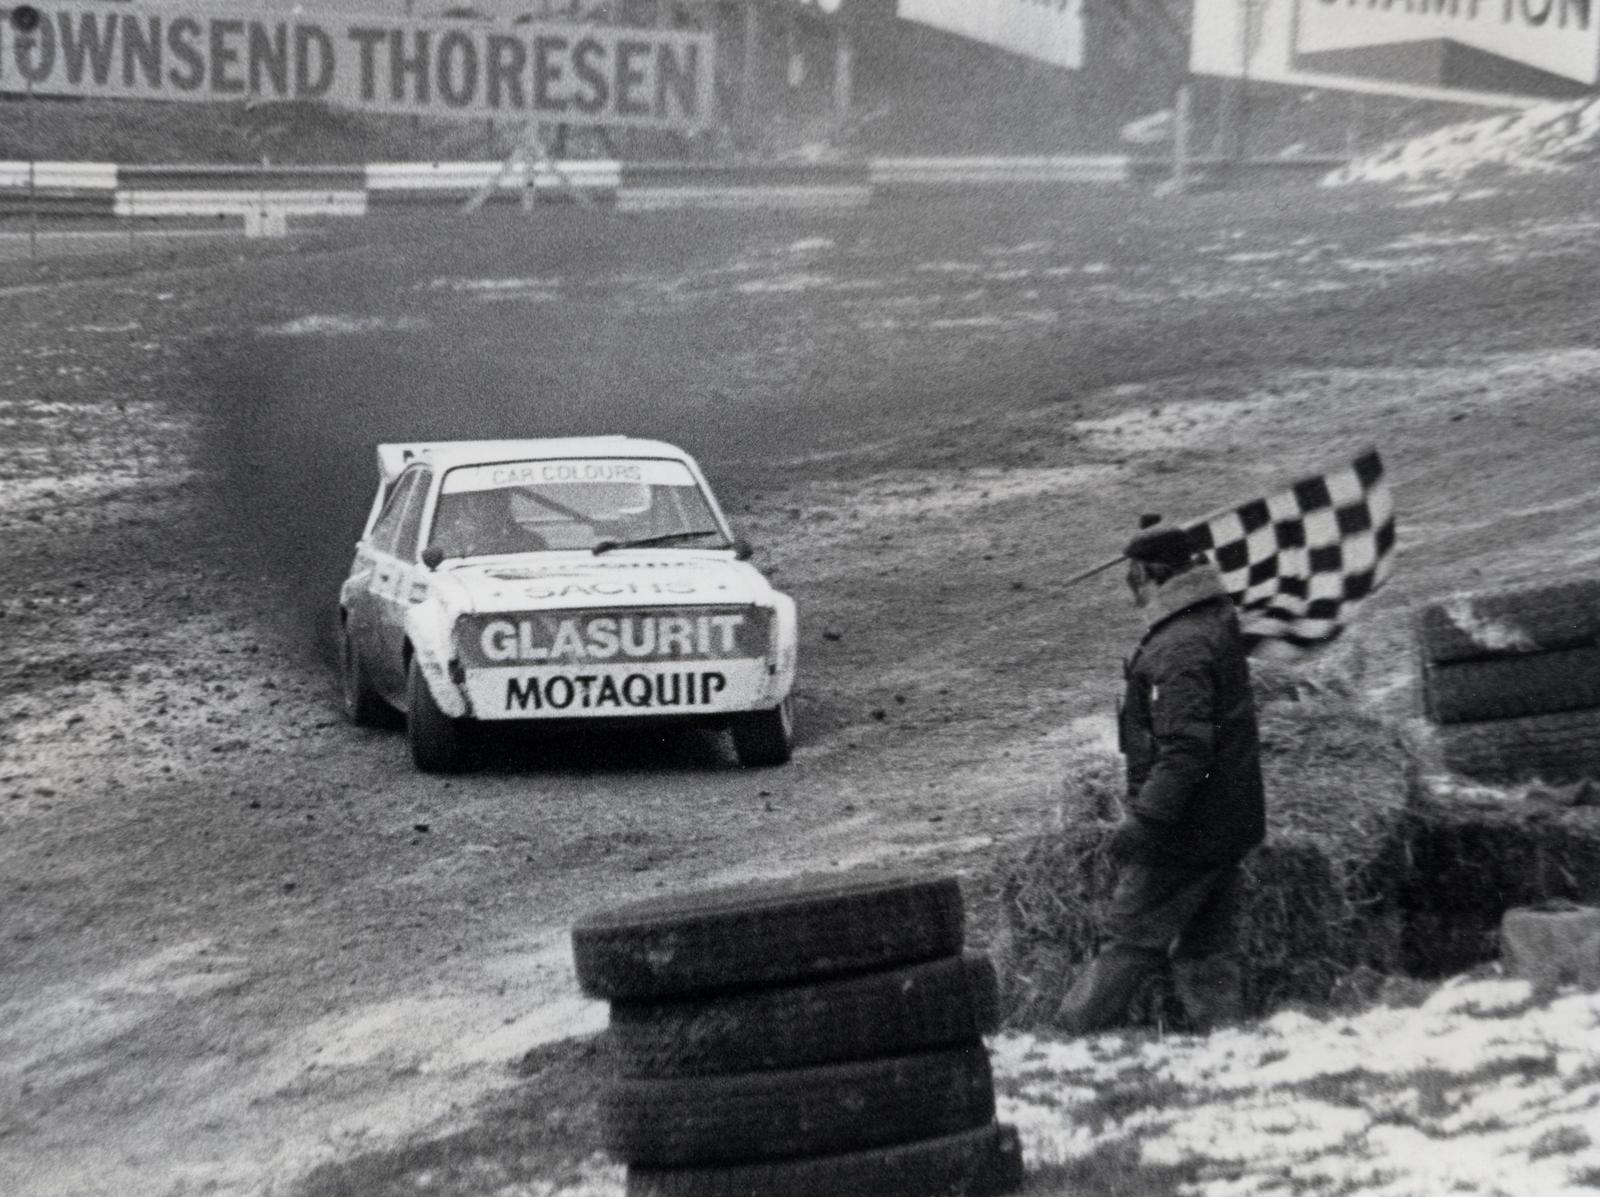 John Welch at Brands Hatch